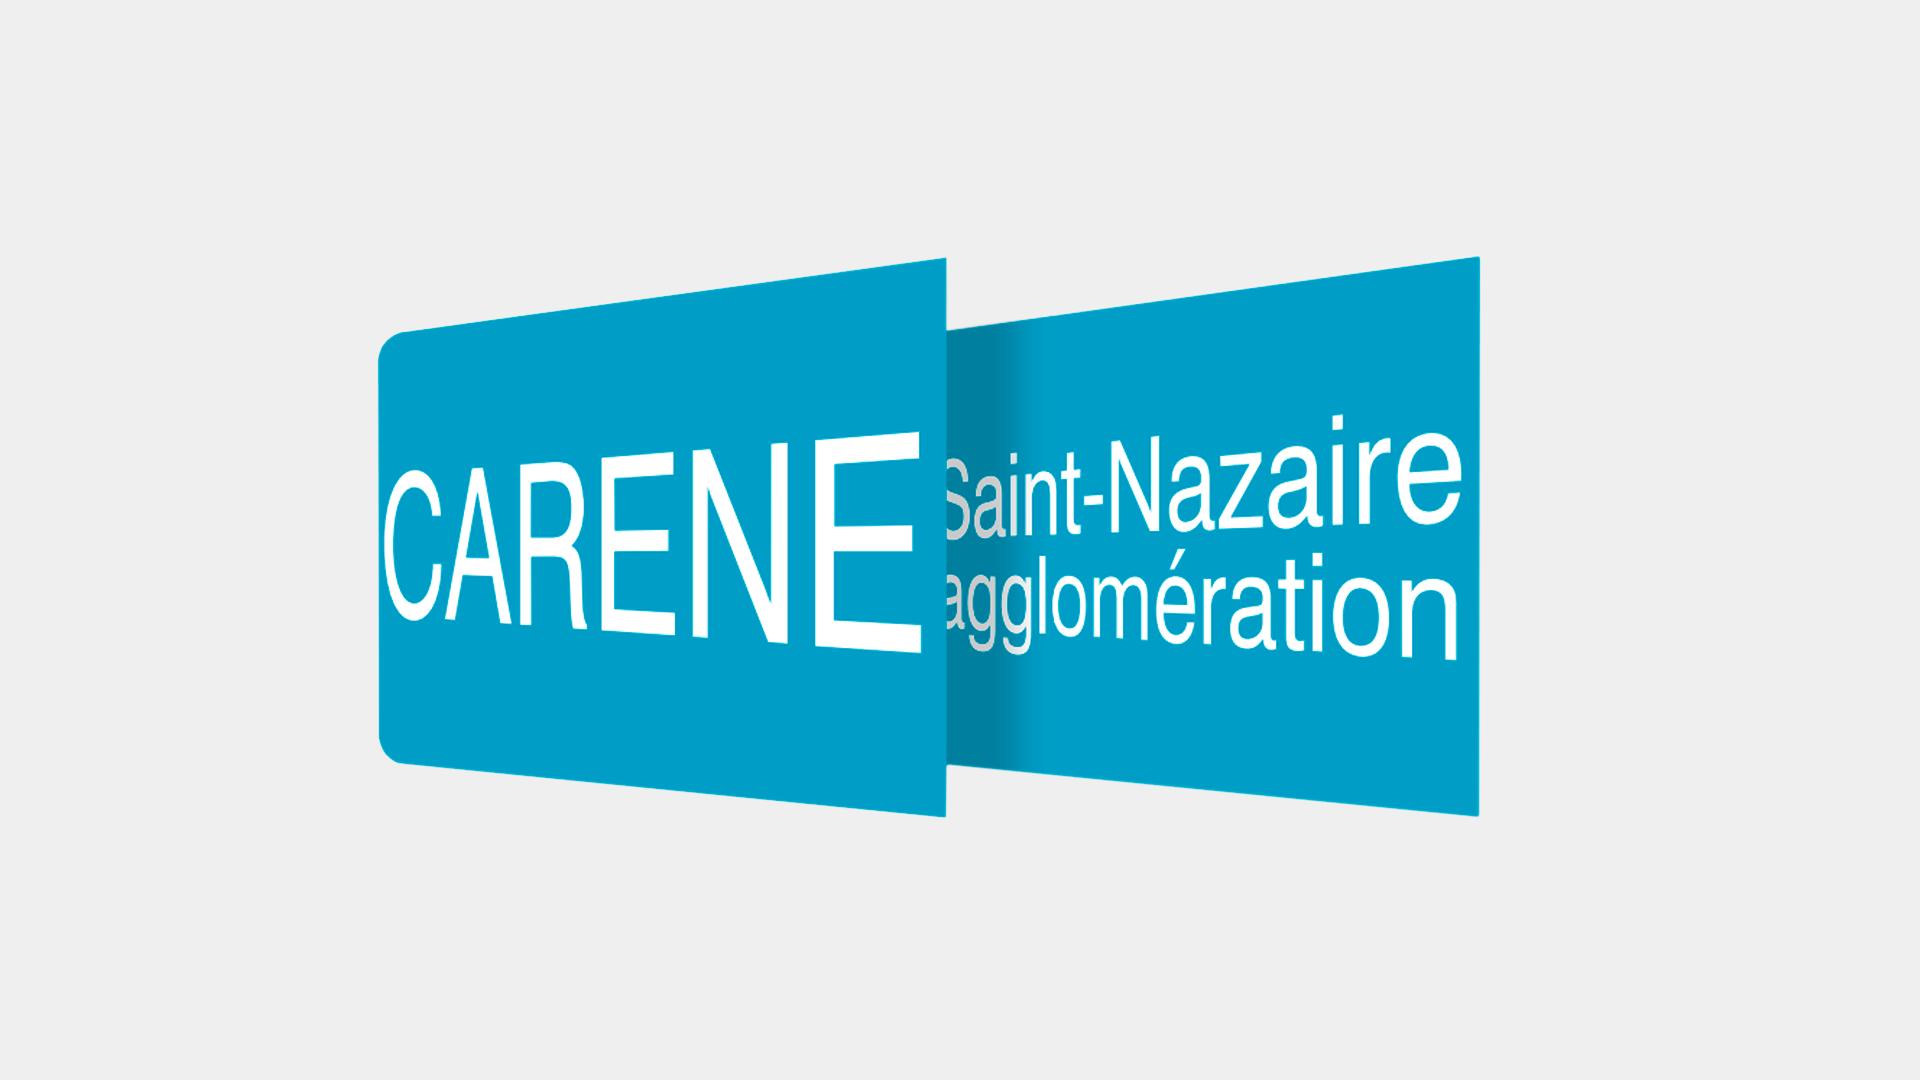 Carene3_1920x1080px